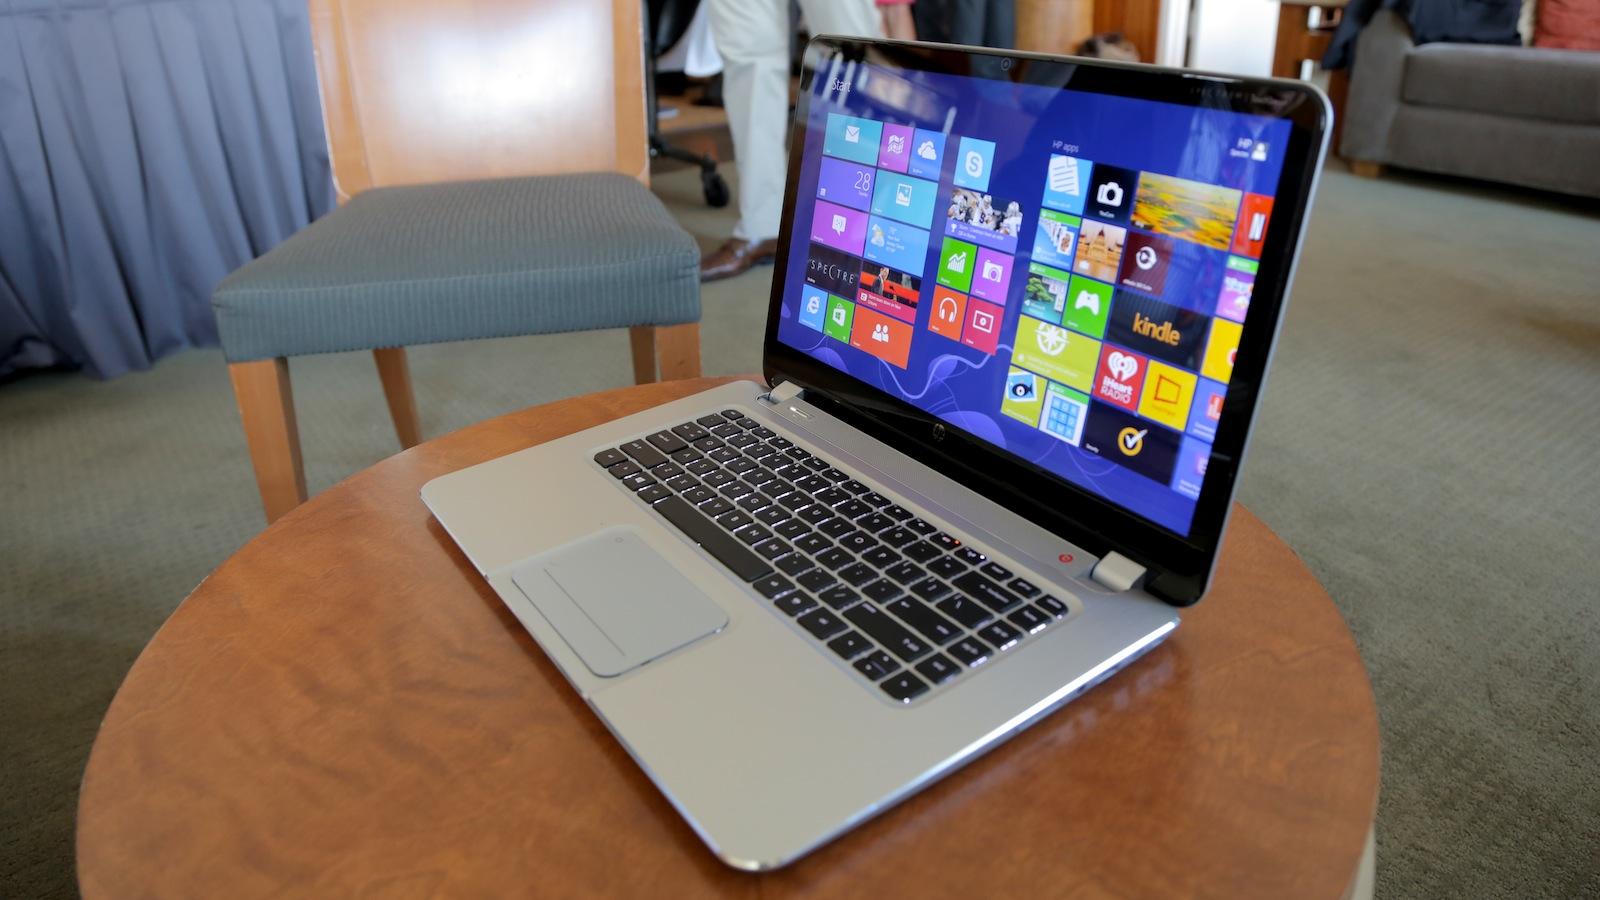 A touchscreen laptop